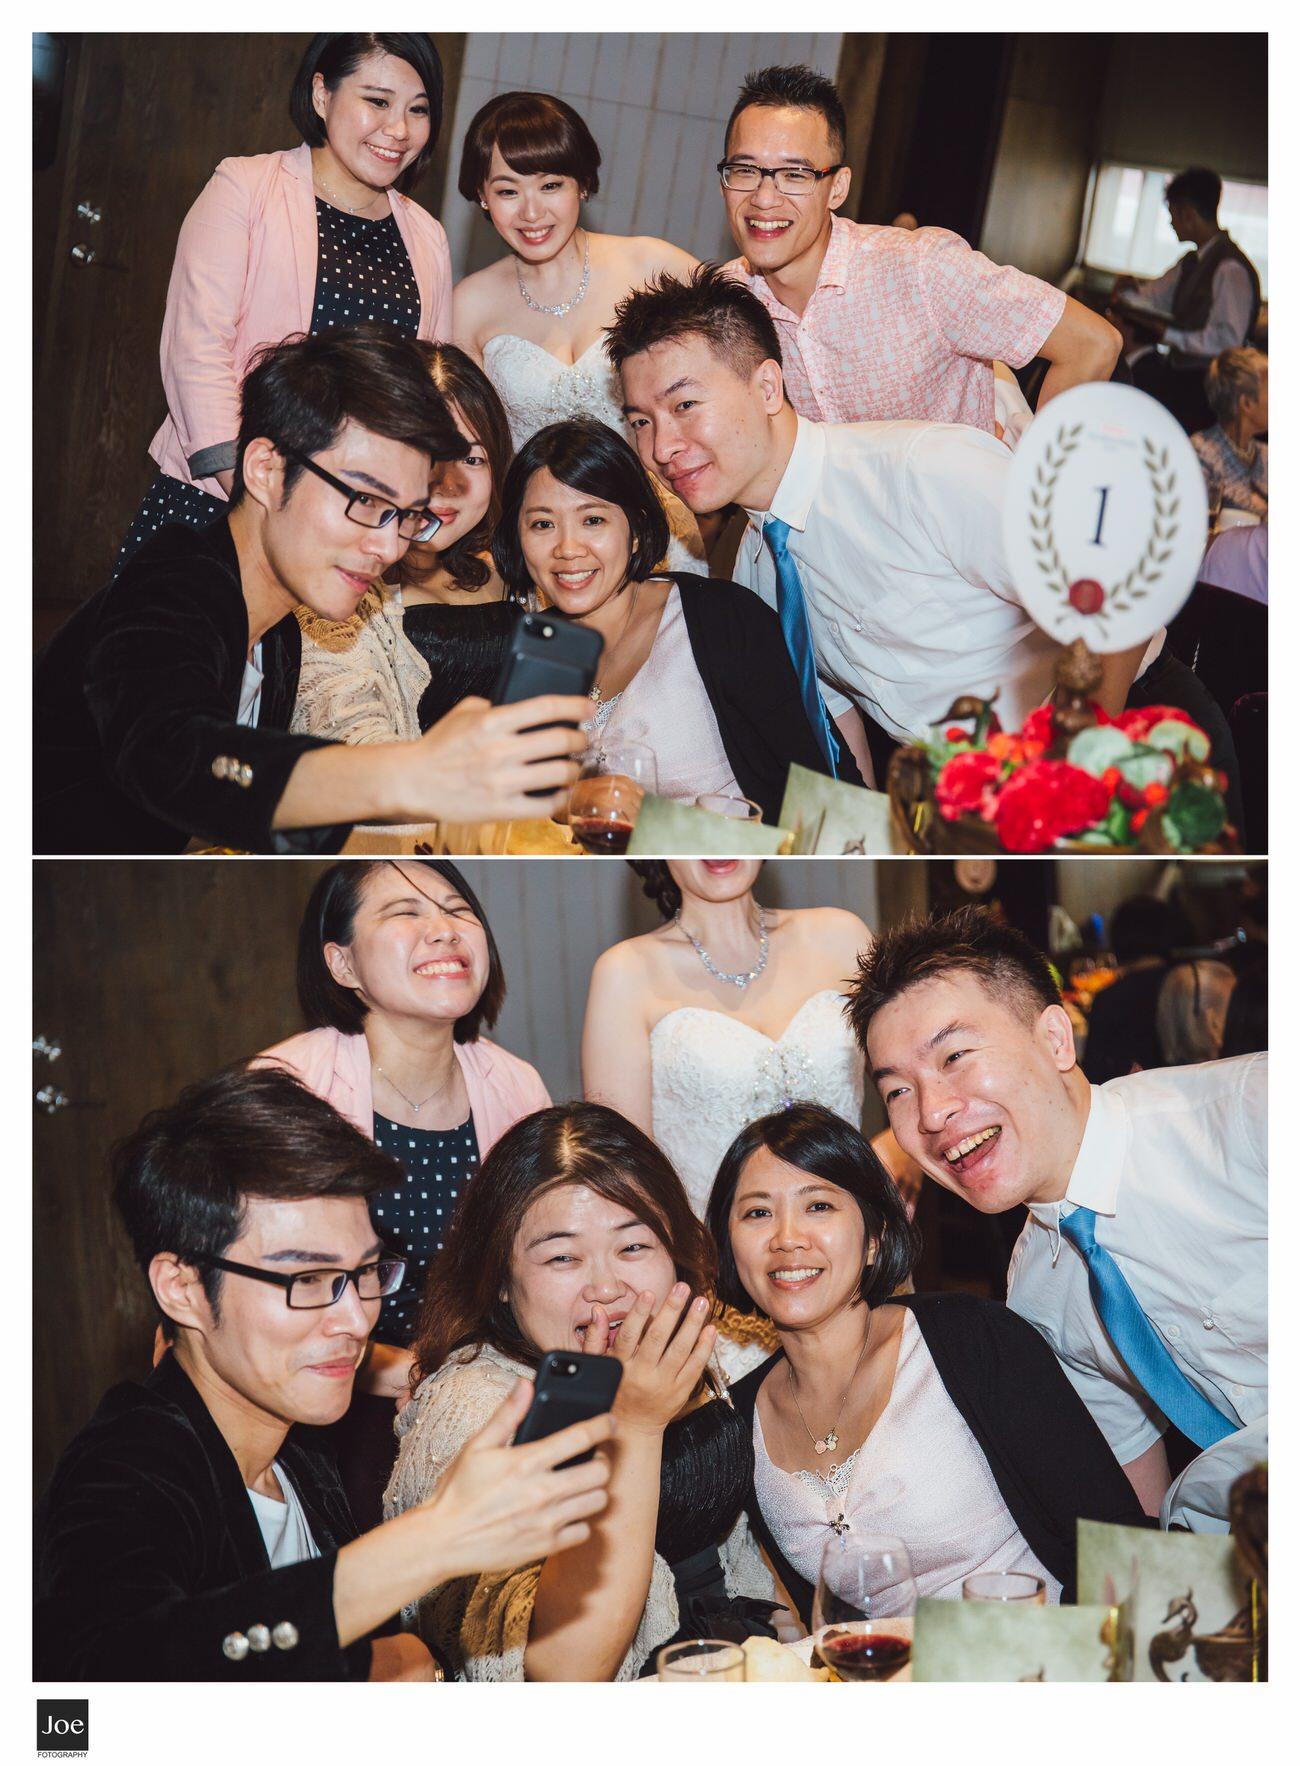 joe-fotography-wedding-photo-palais-de-chine-hotel-041.jpg